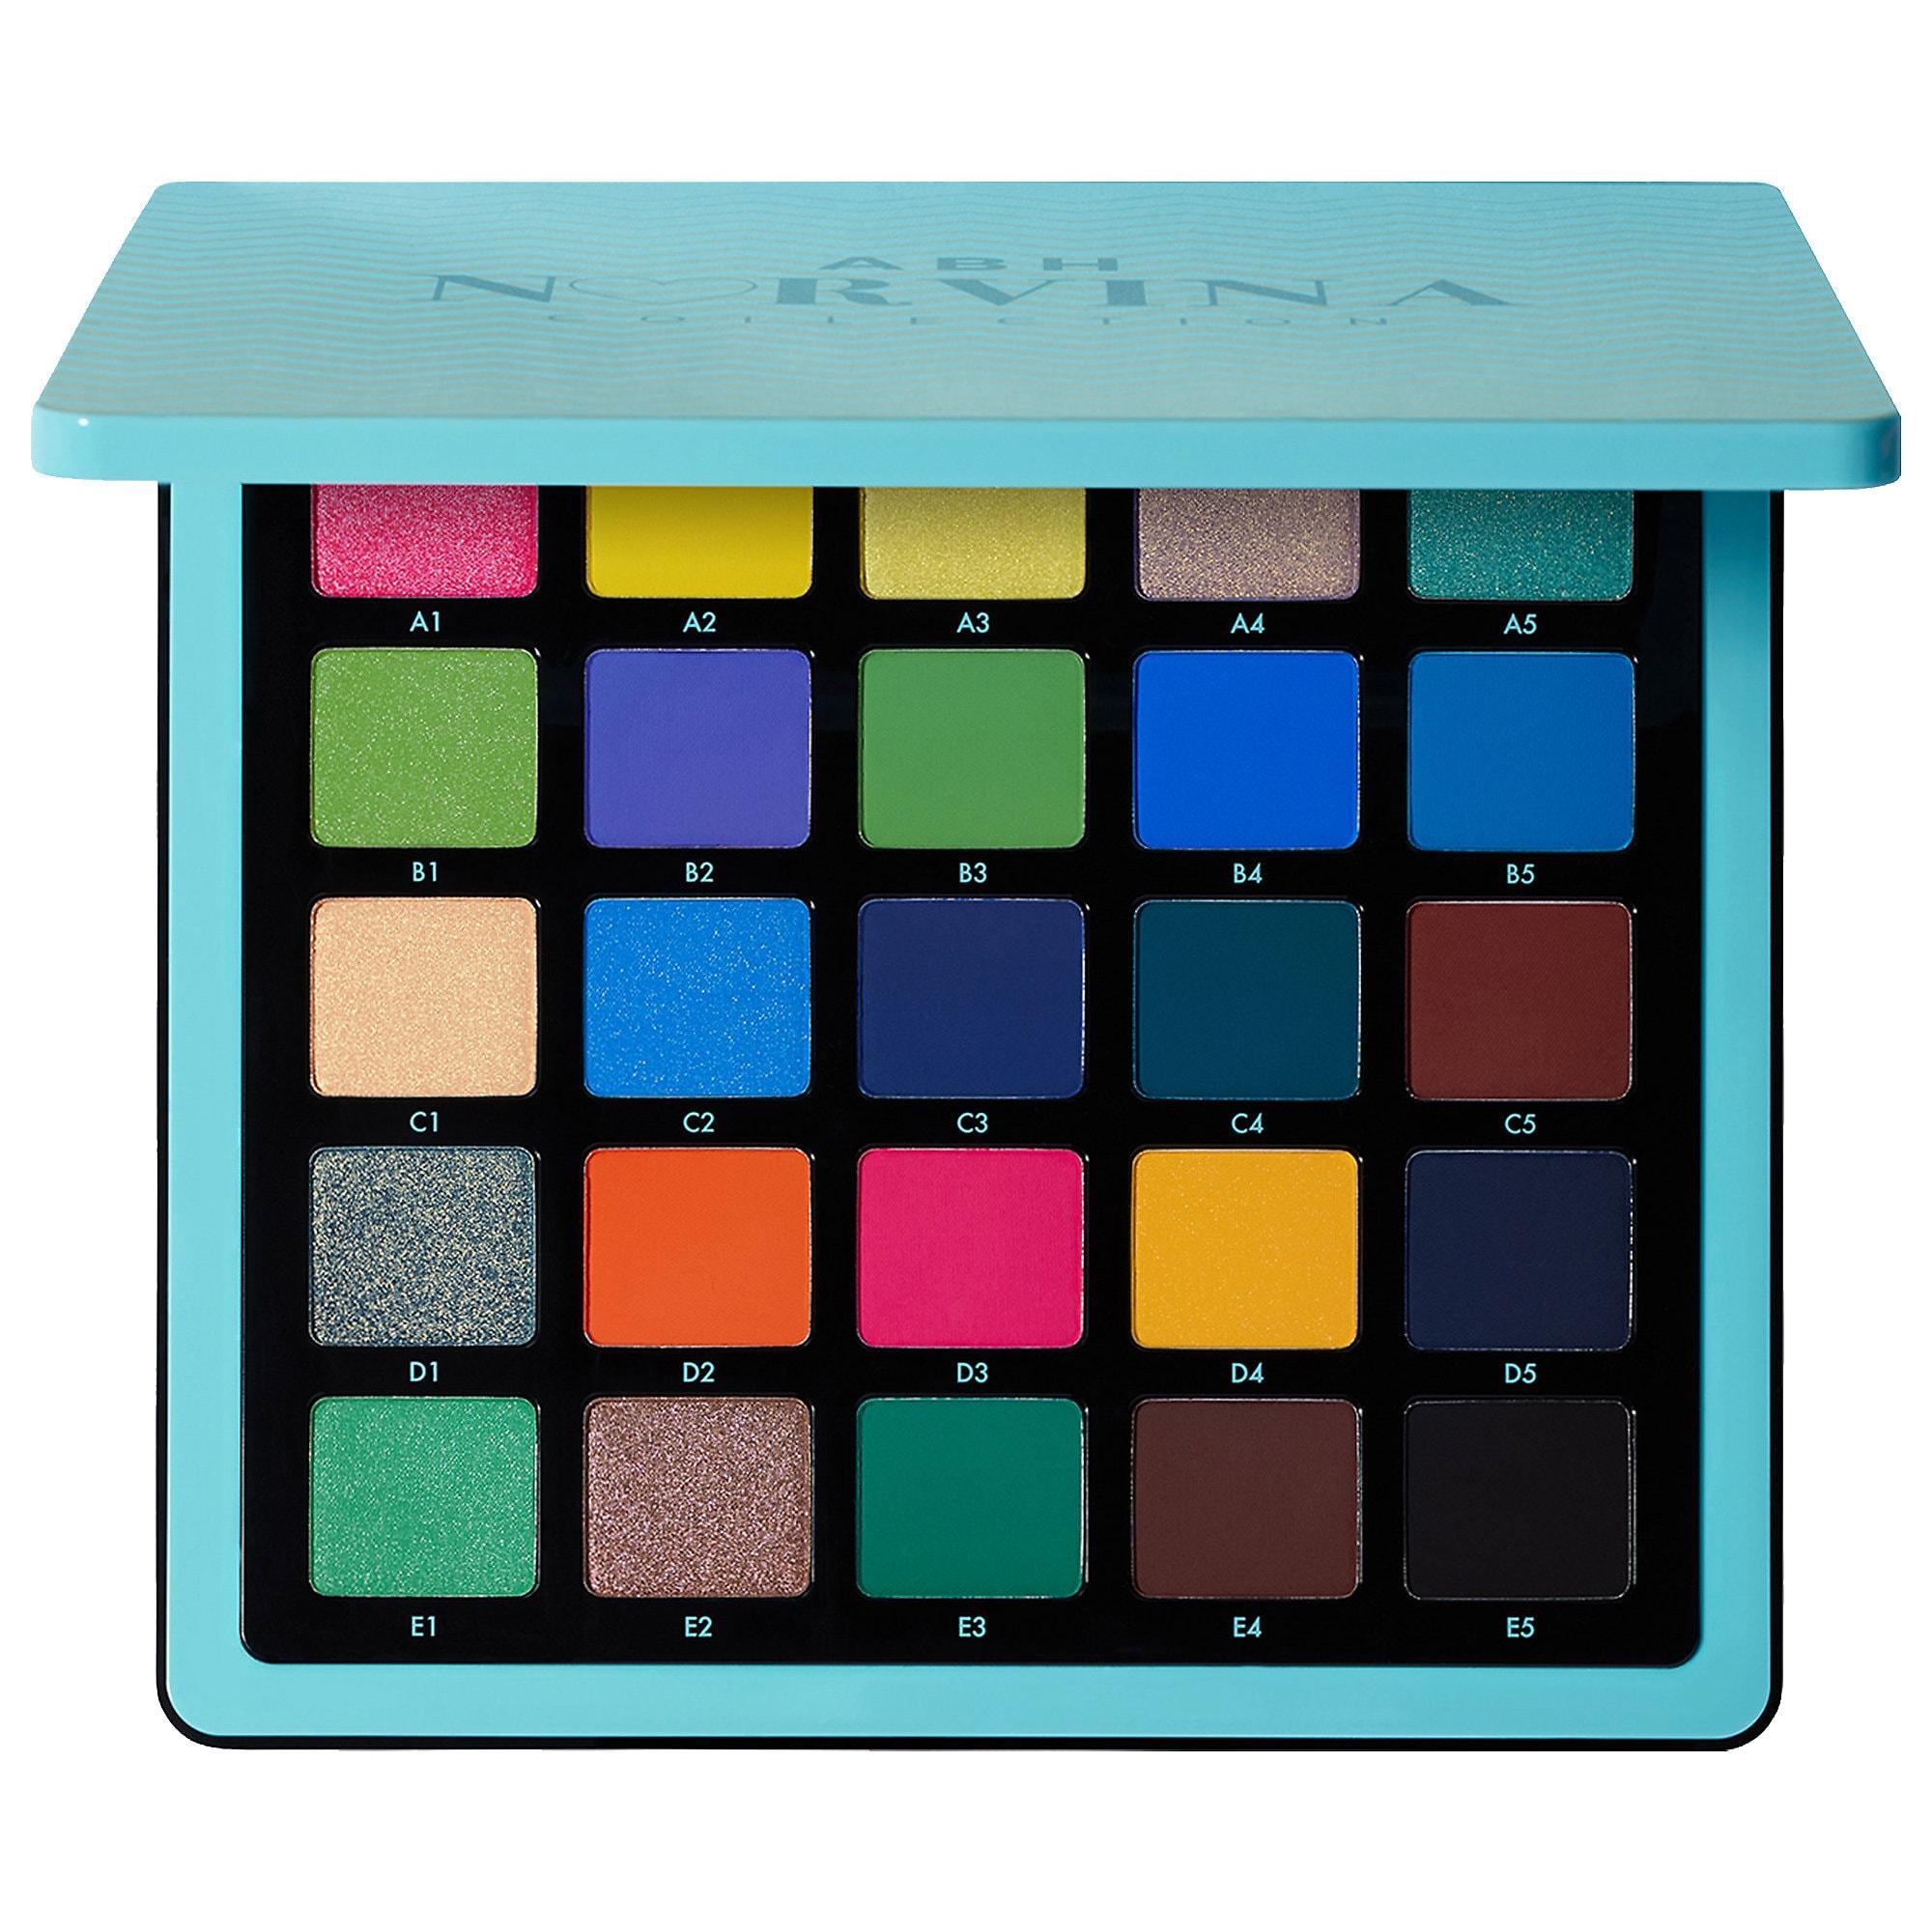 Box Anastasia Beverly Hills Norvina Collection Volume 2 Pro Pigment Palette